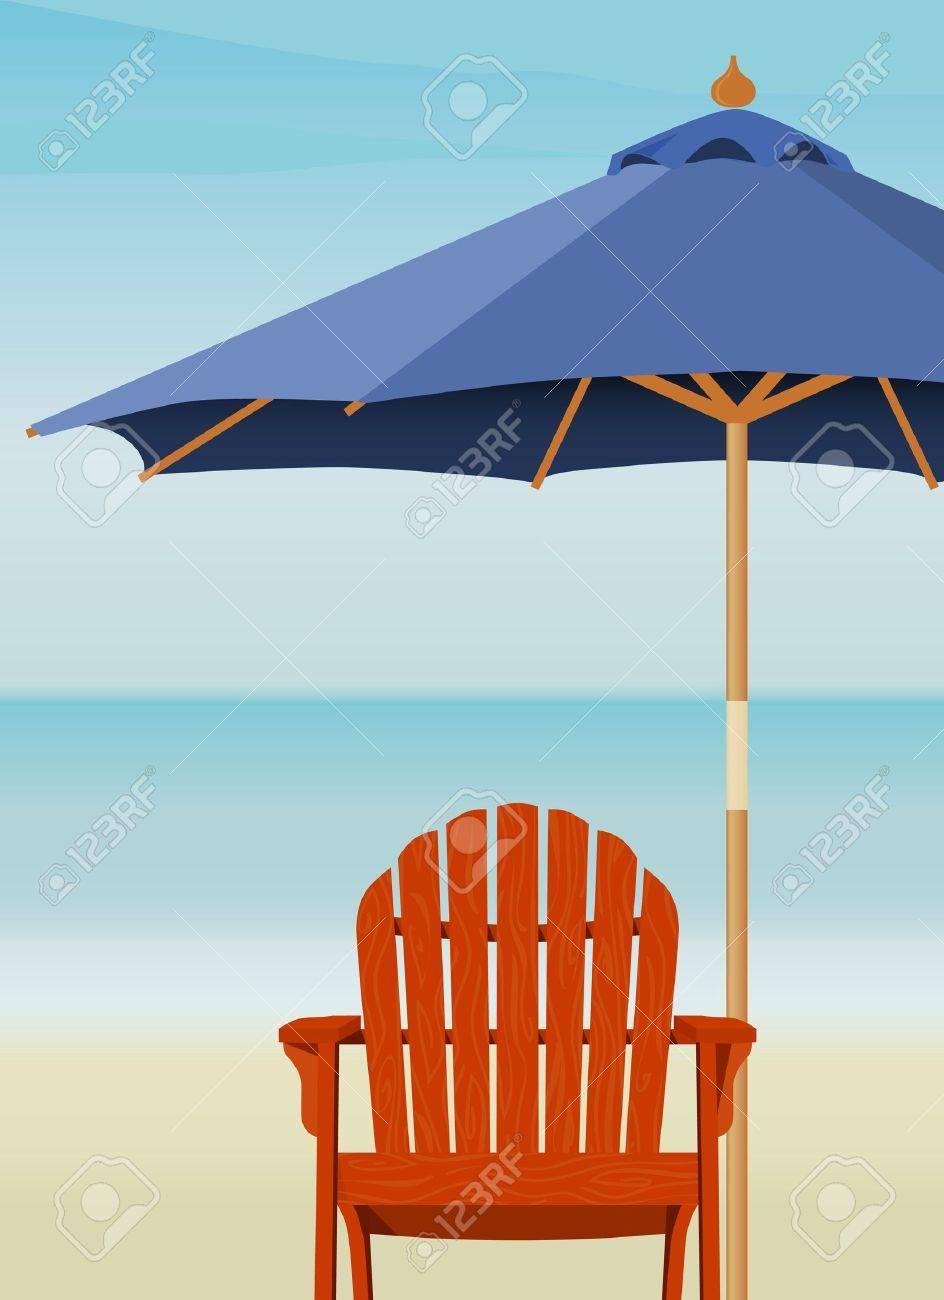 Beach chair with umbrella painting - Beach Umbrella Adirondack Chair And Market Umbrella At Beach Chair And Umbrella Are Complete